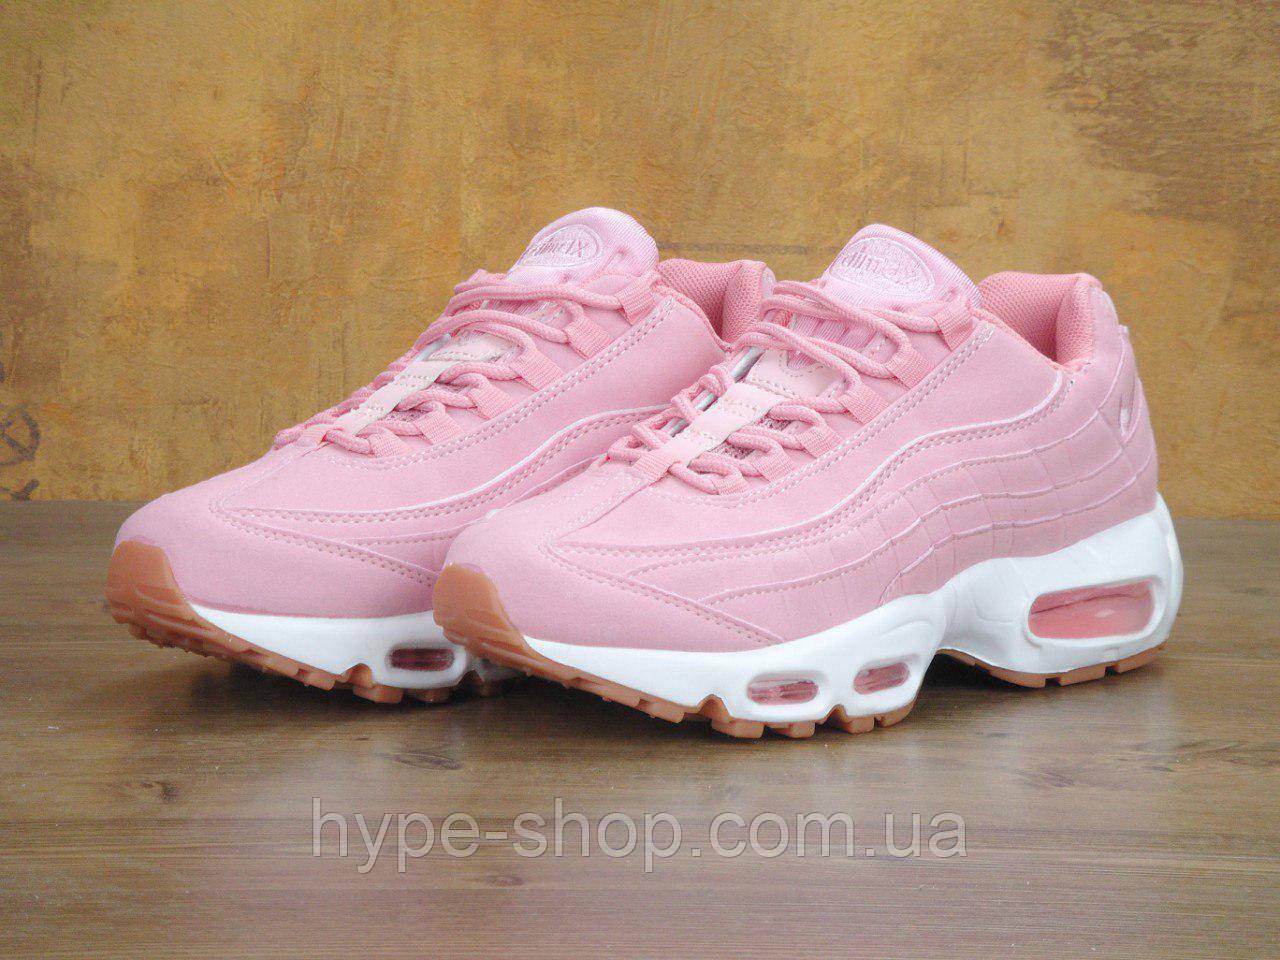 Женские кроссовки в стиле Nike Air Max 95 | Топ Качество!